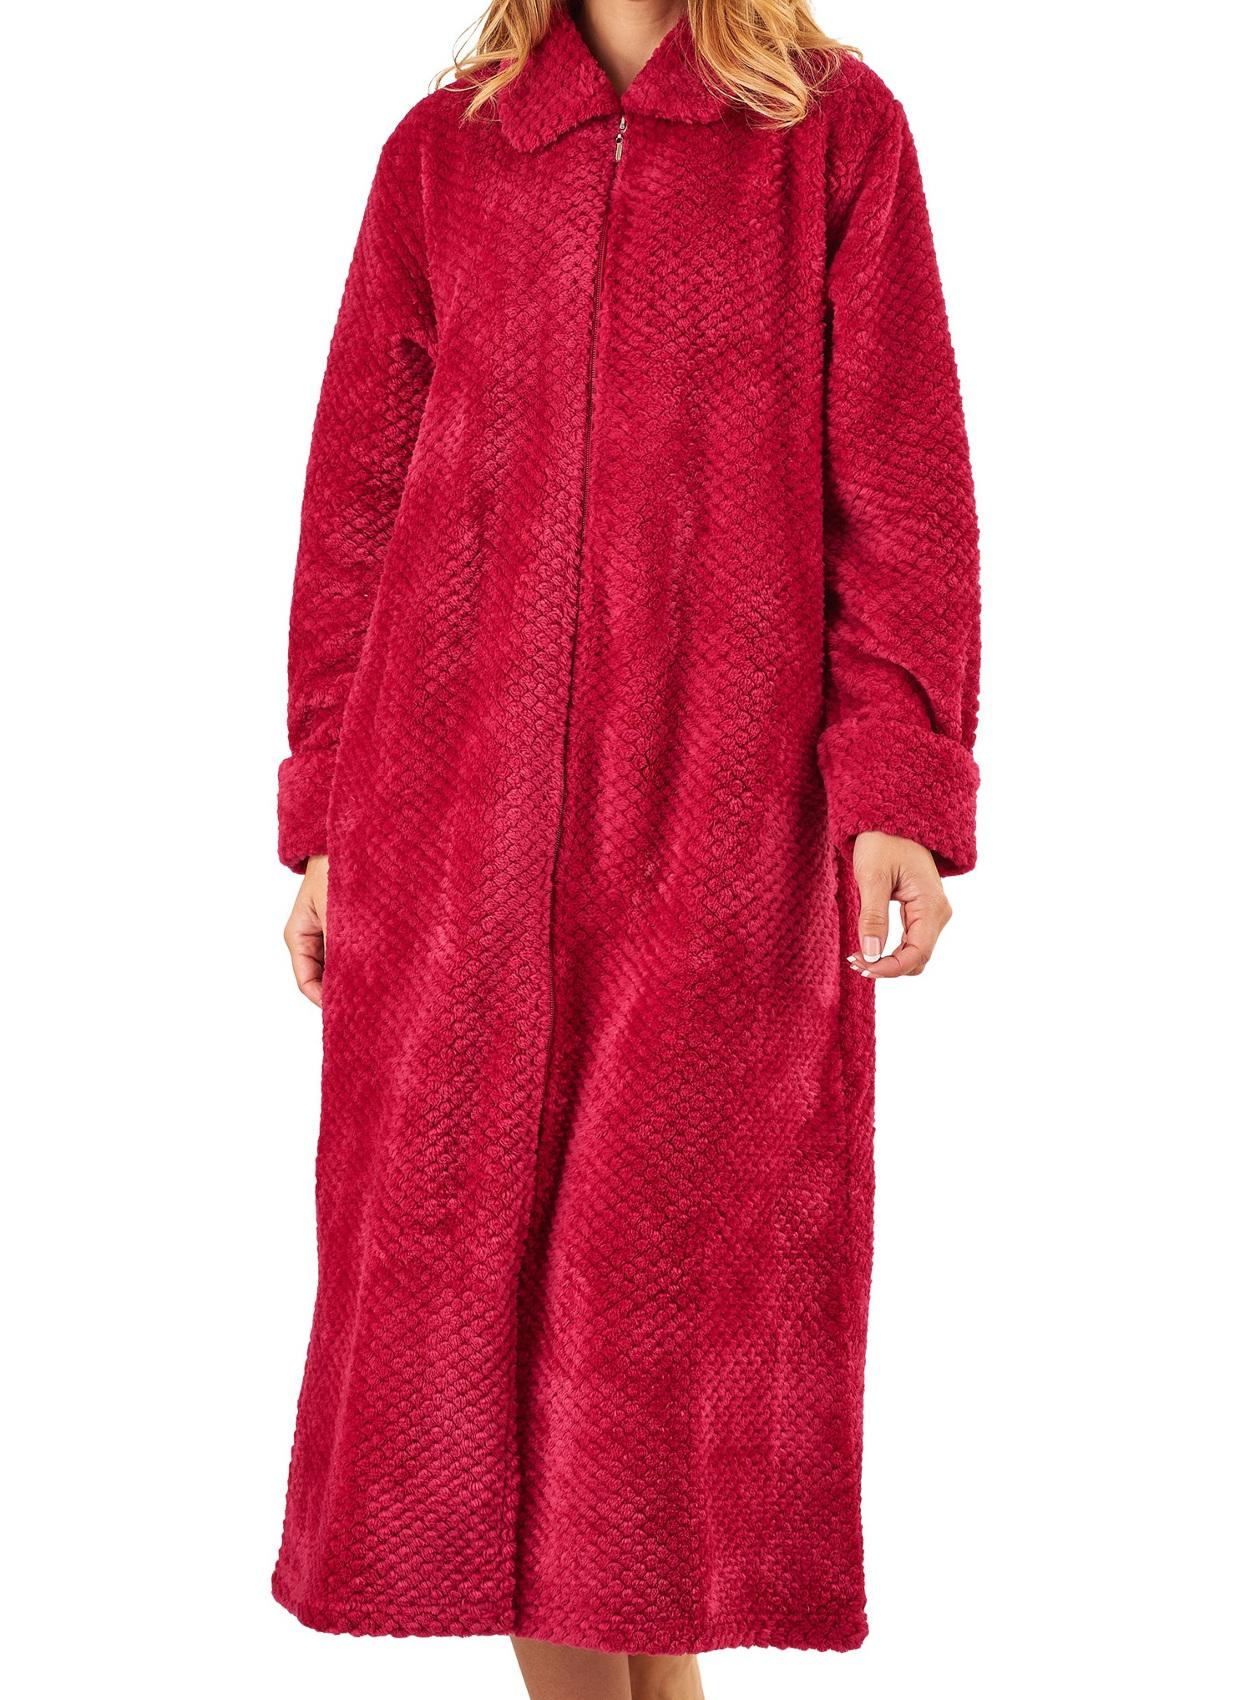 Dressing Gown Ladies Zip up Soft Waffle Fleece Slenderella Nightwear ...